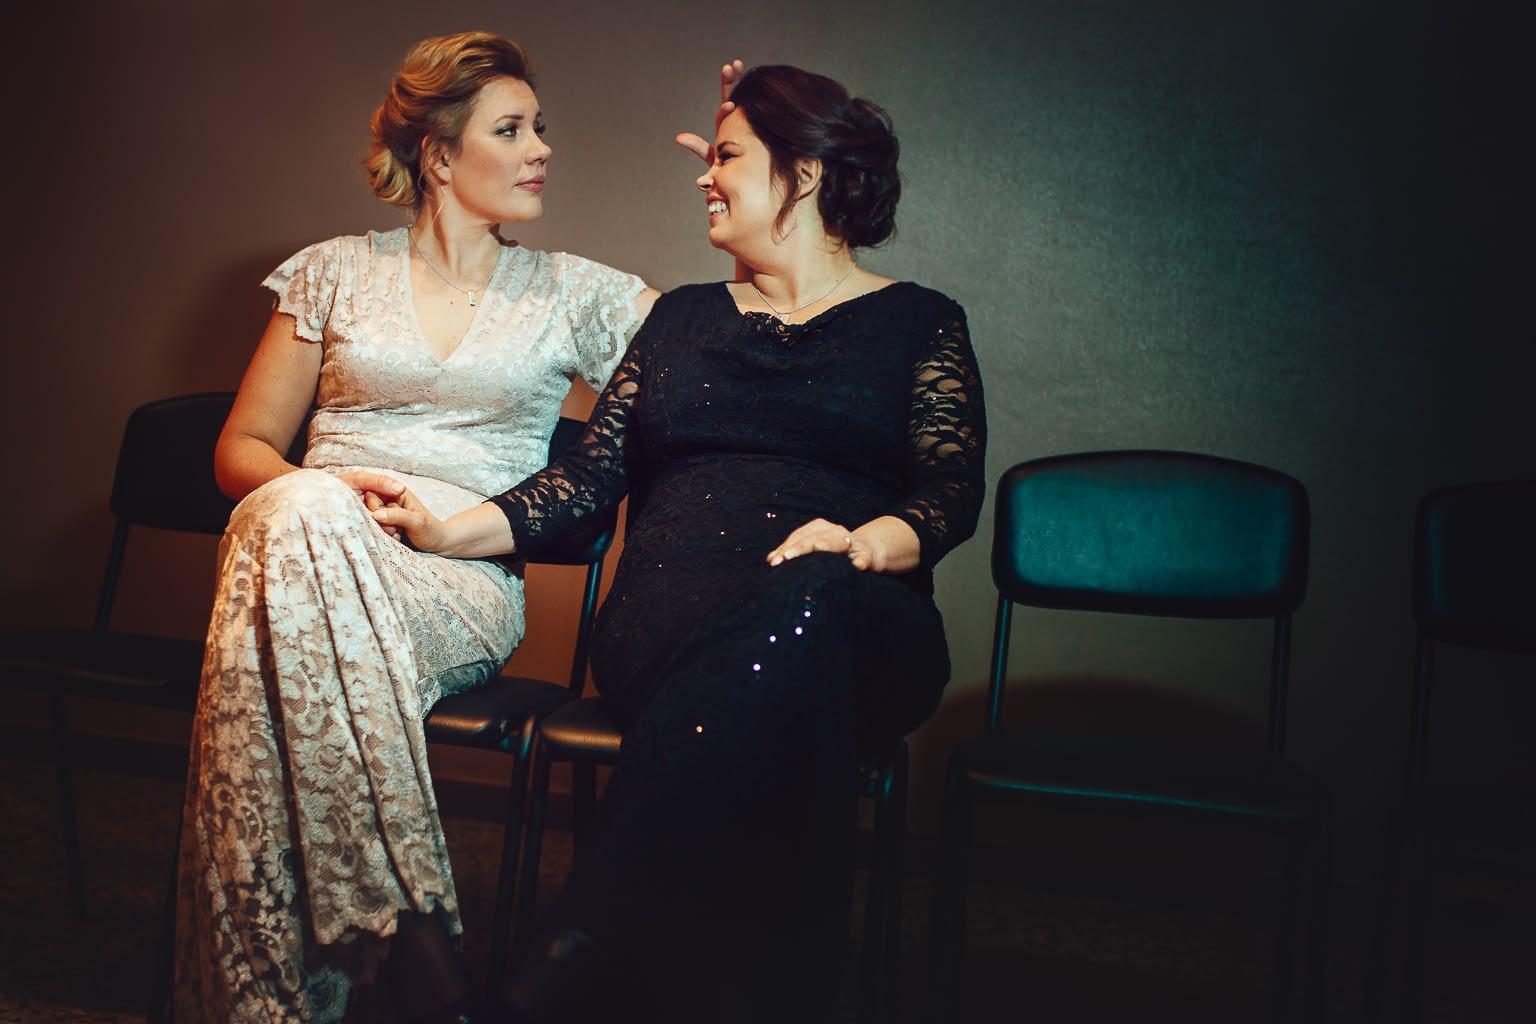 photographie mariage lgbt haute gamme rennes